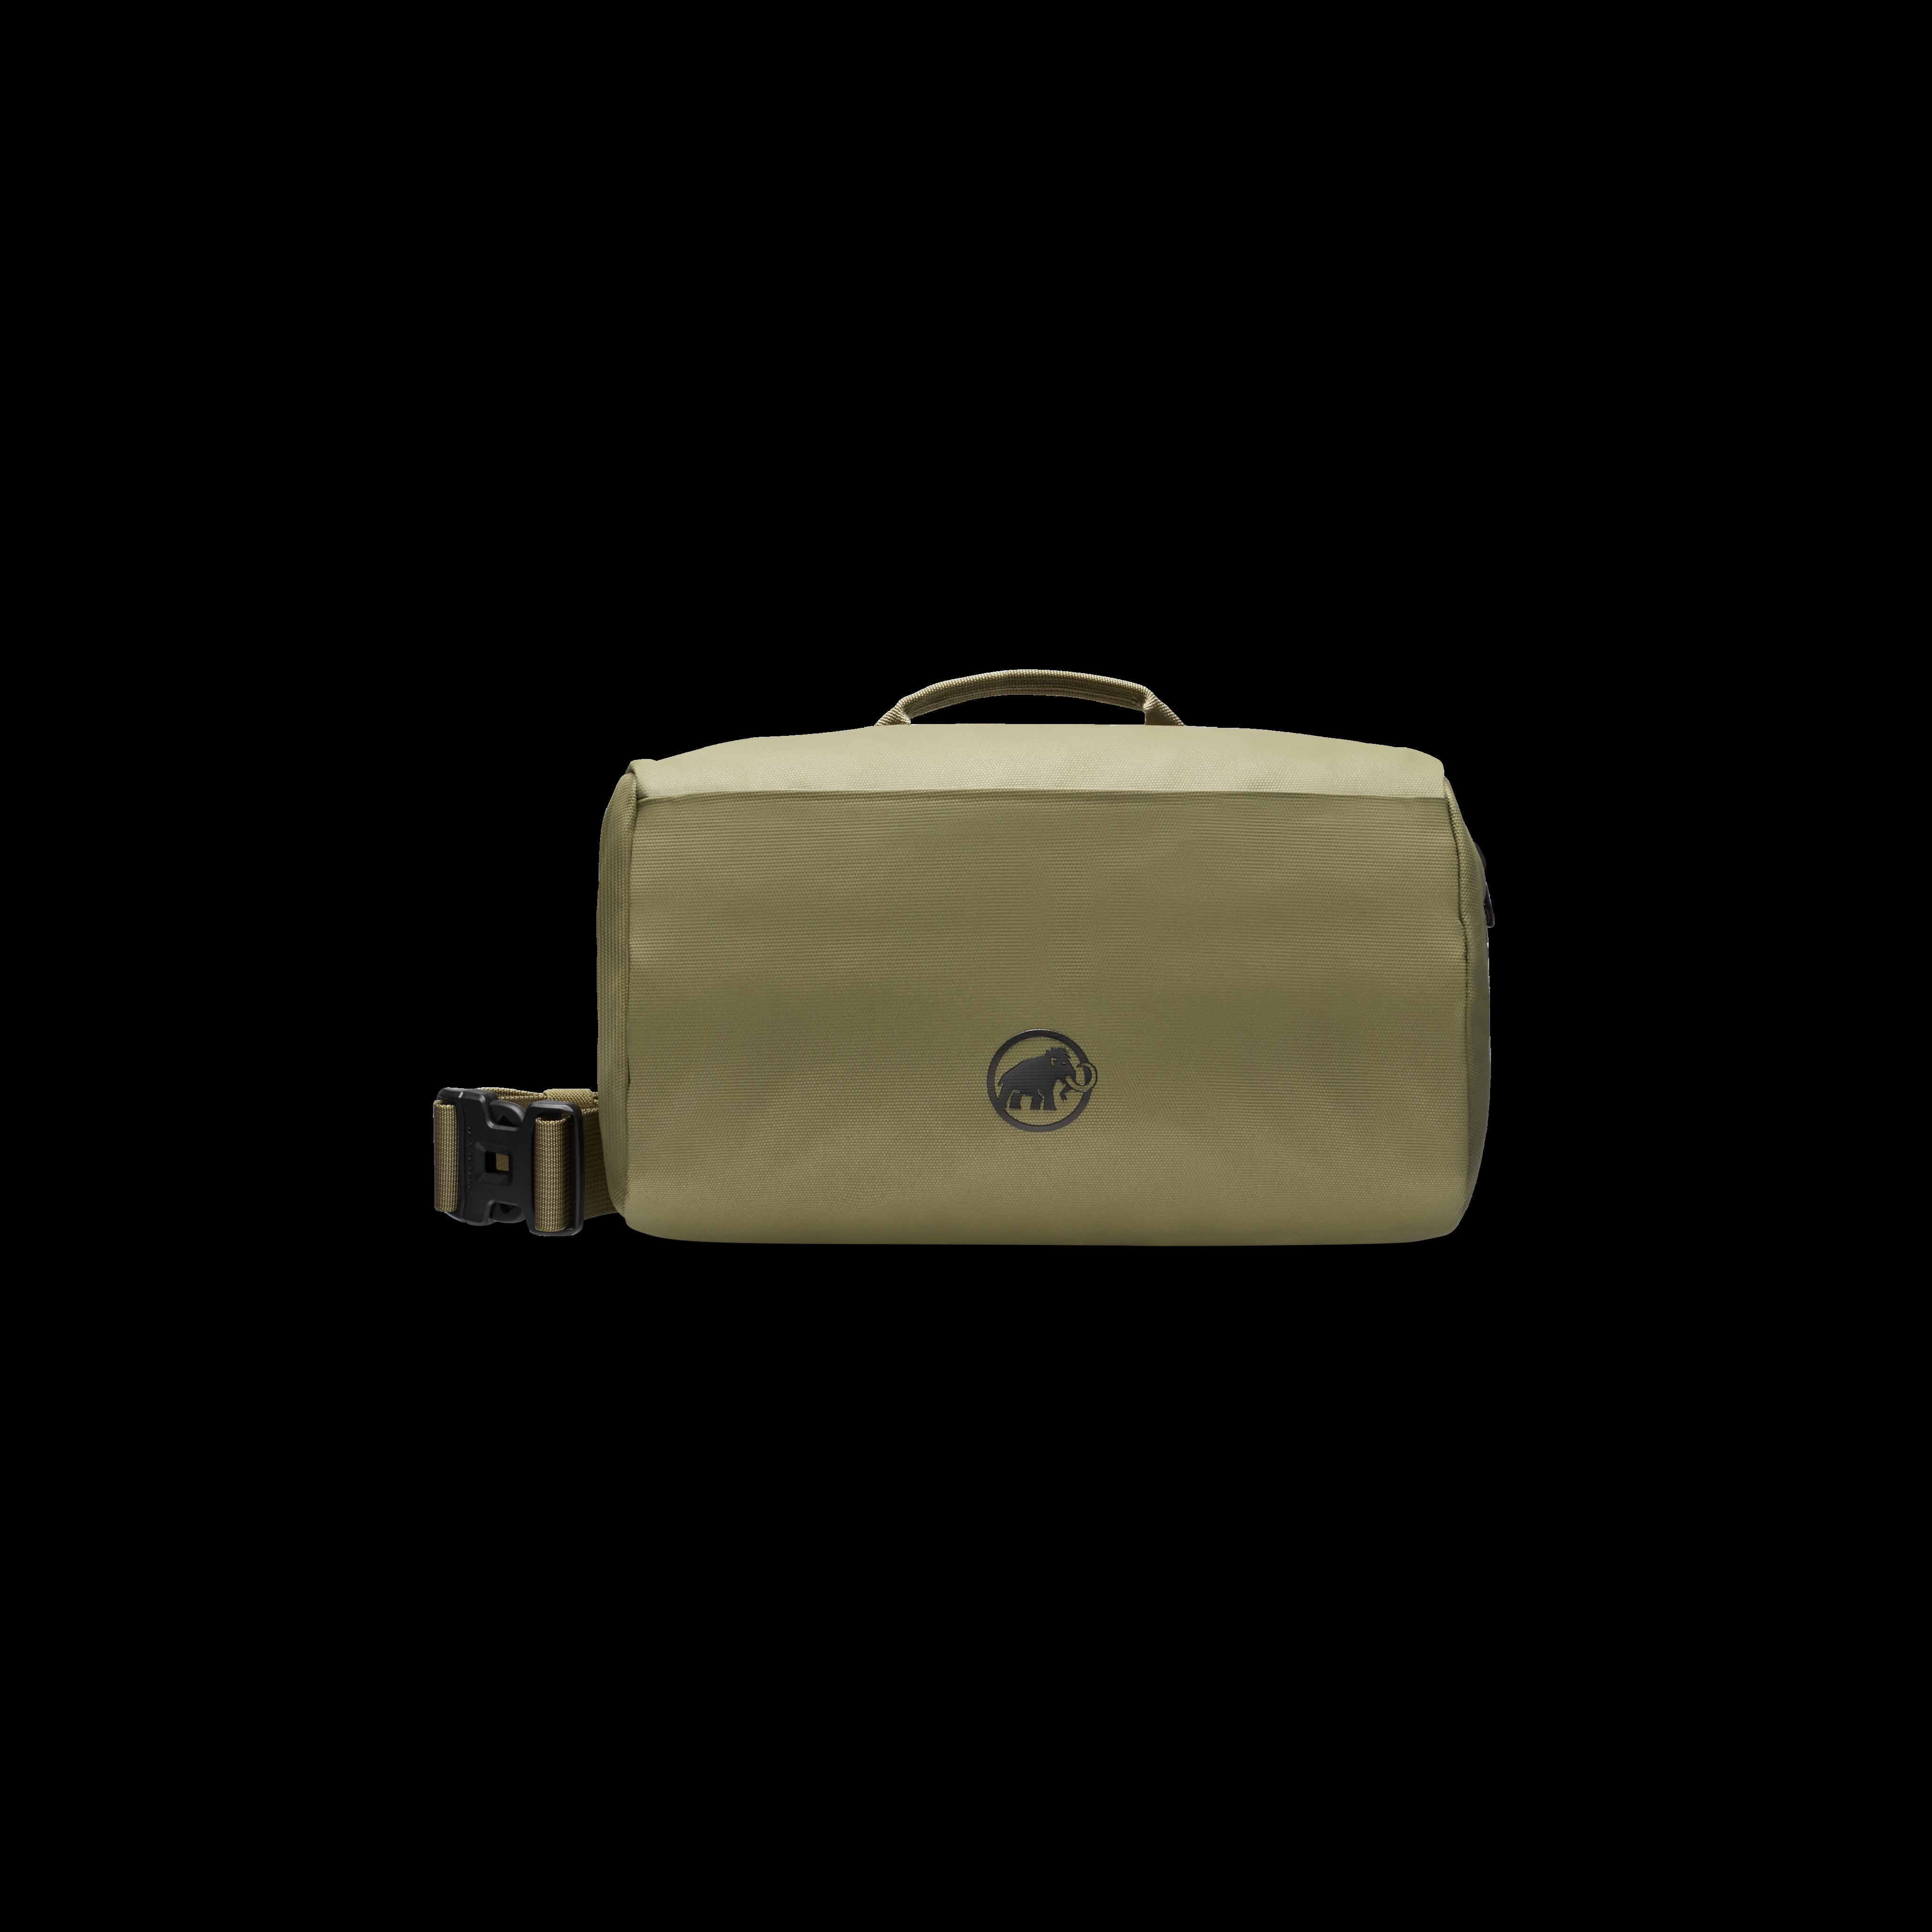 Seon 2-Way Waistpack - 4 L, olive thumbnail